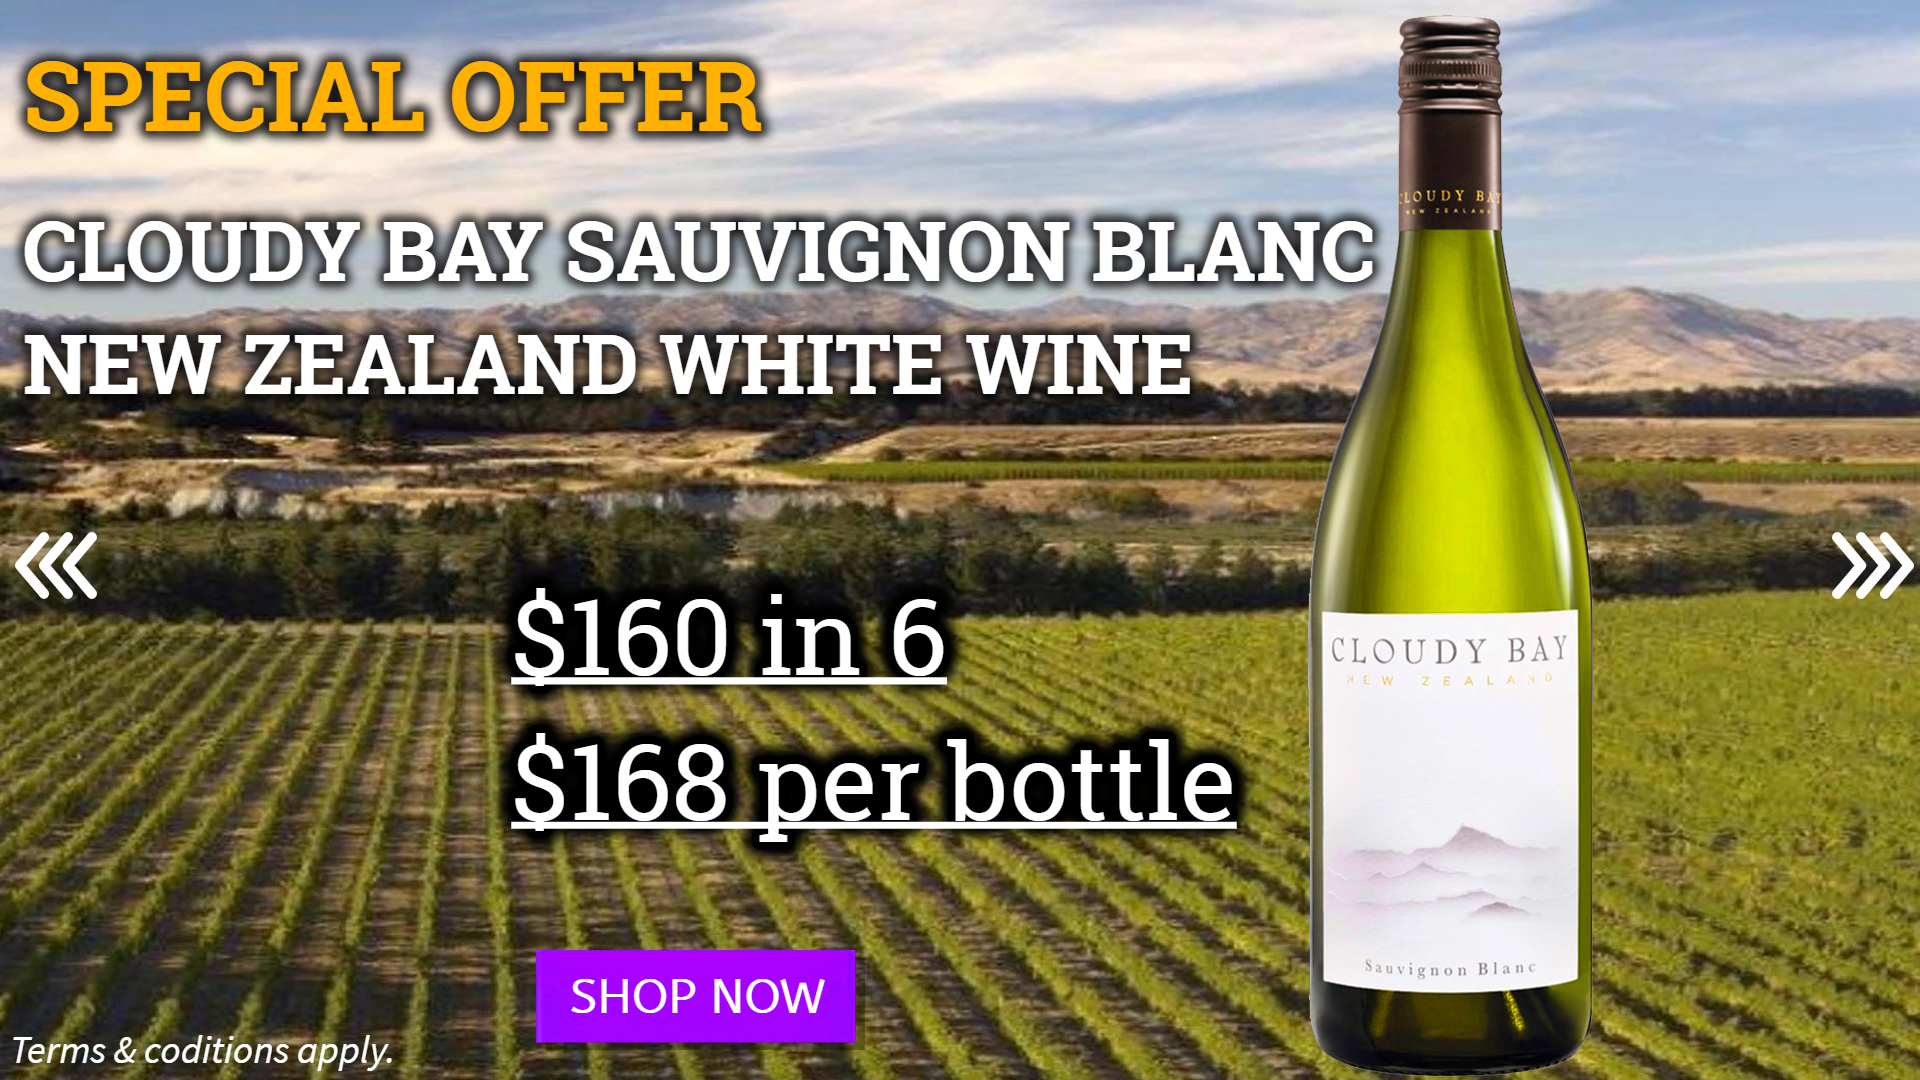 cloudybay,sauvignonblanc,newzeland,whitewine,紐西蘭白酒,長相思,雲霧灣,超市酒,香港,rngwine,hktvmall,白酒,bidvino